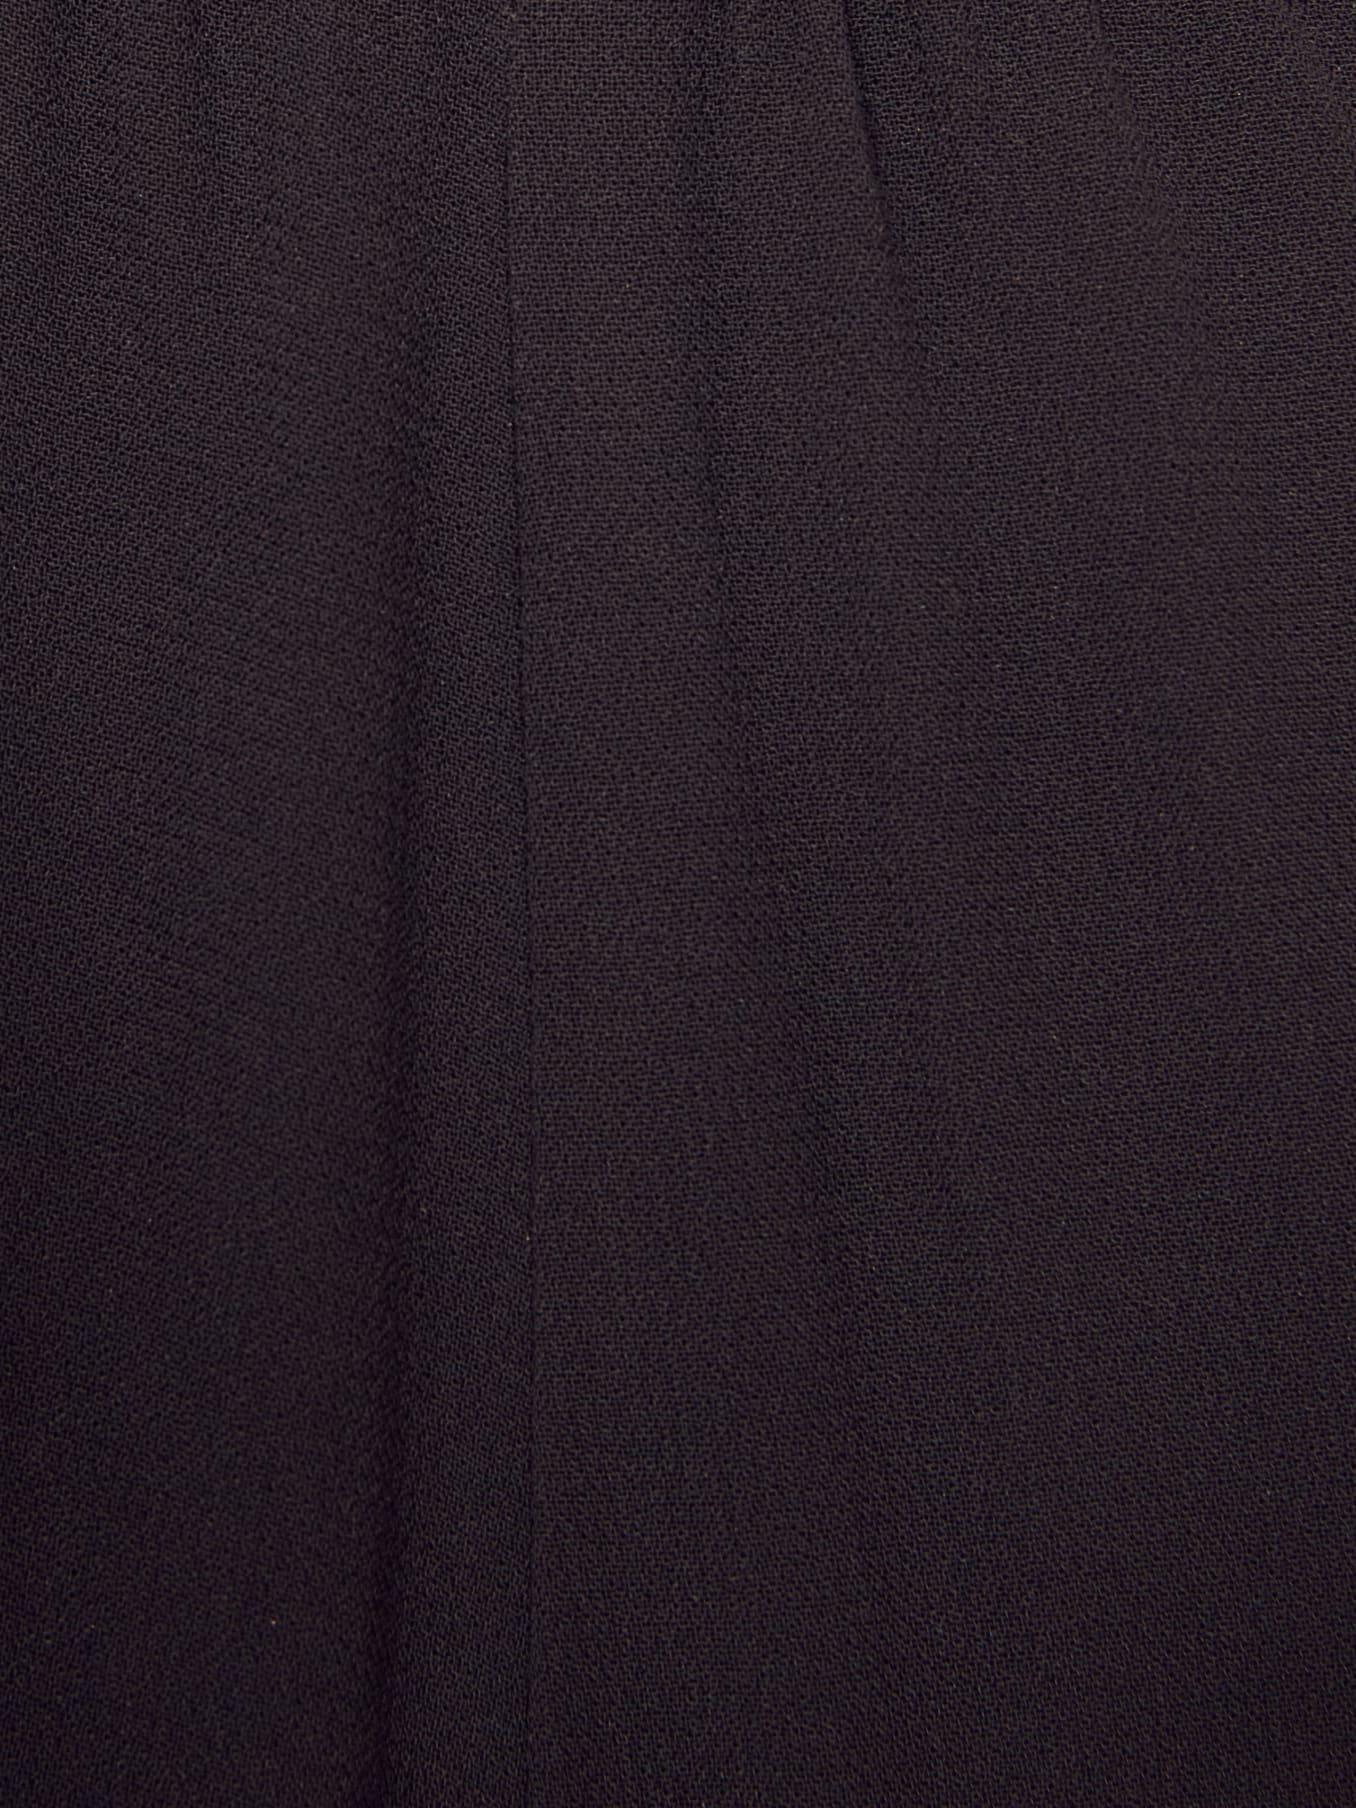 REFORMATION Shelley Black Dress